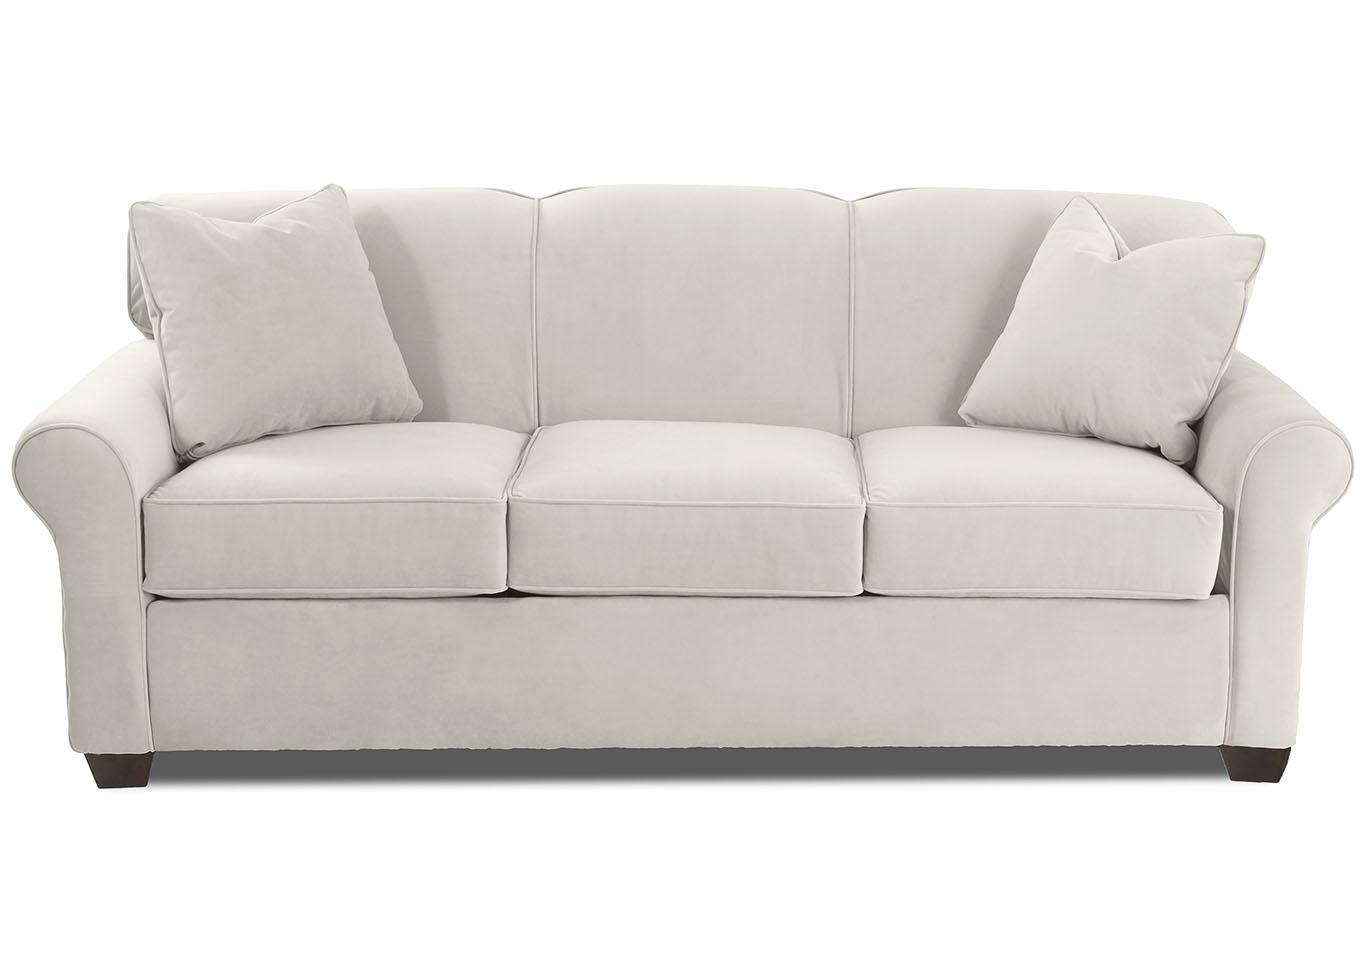 Mayhew White Sleeper Fabric Sofa Furniture World